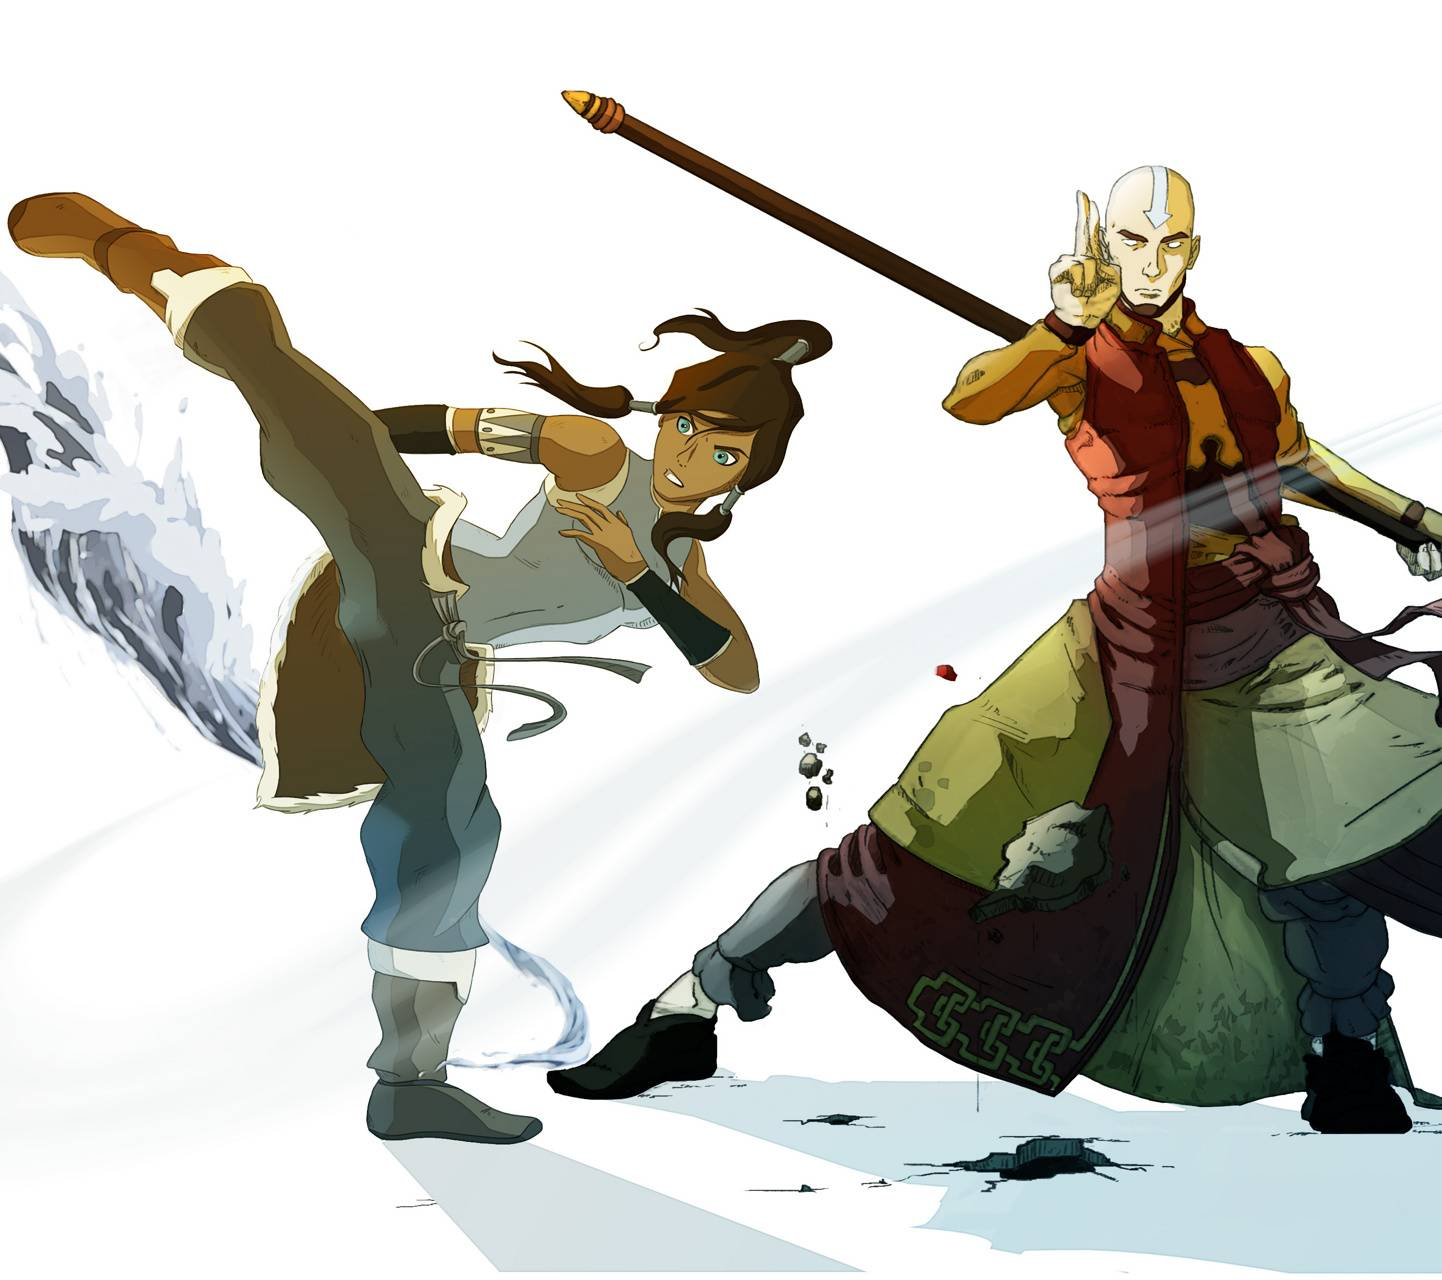 Aang And Korra Wallpaper By Willkomme C7 Free On Zedge